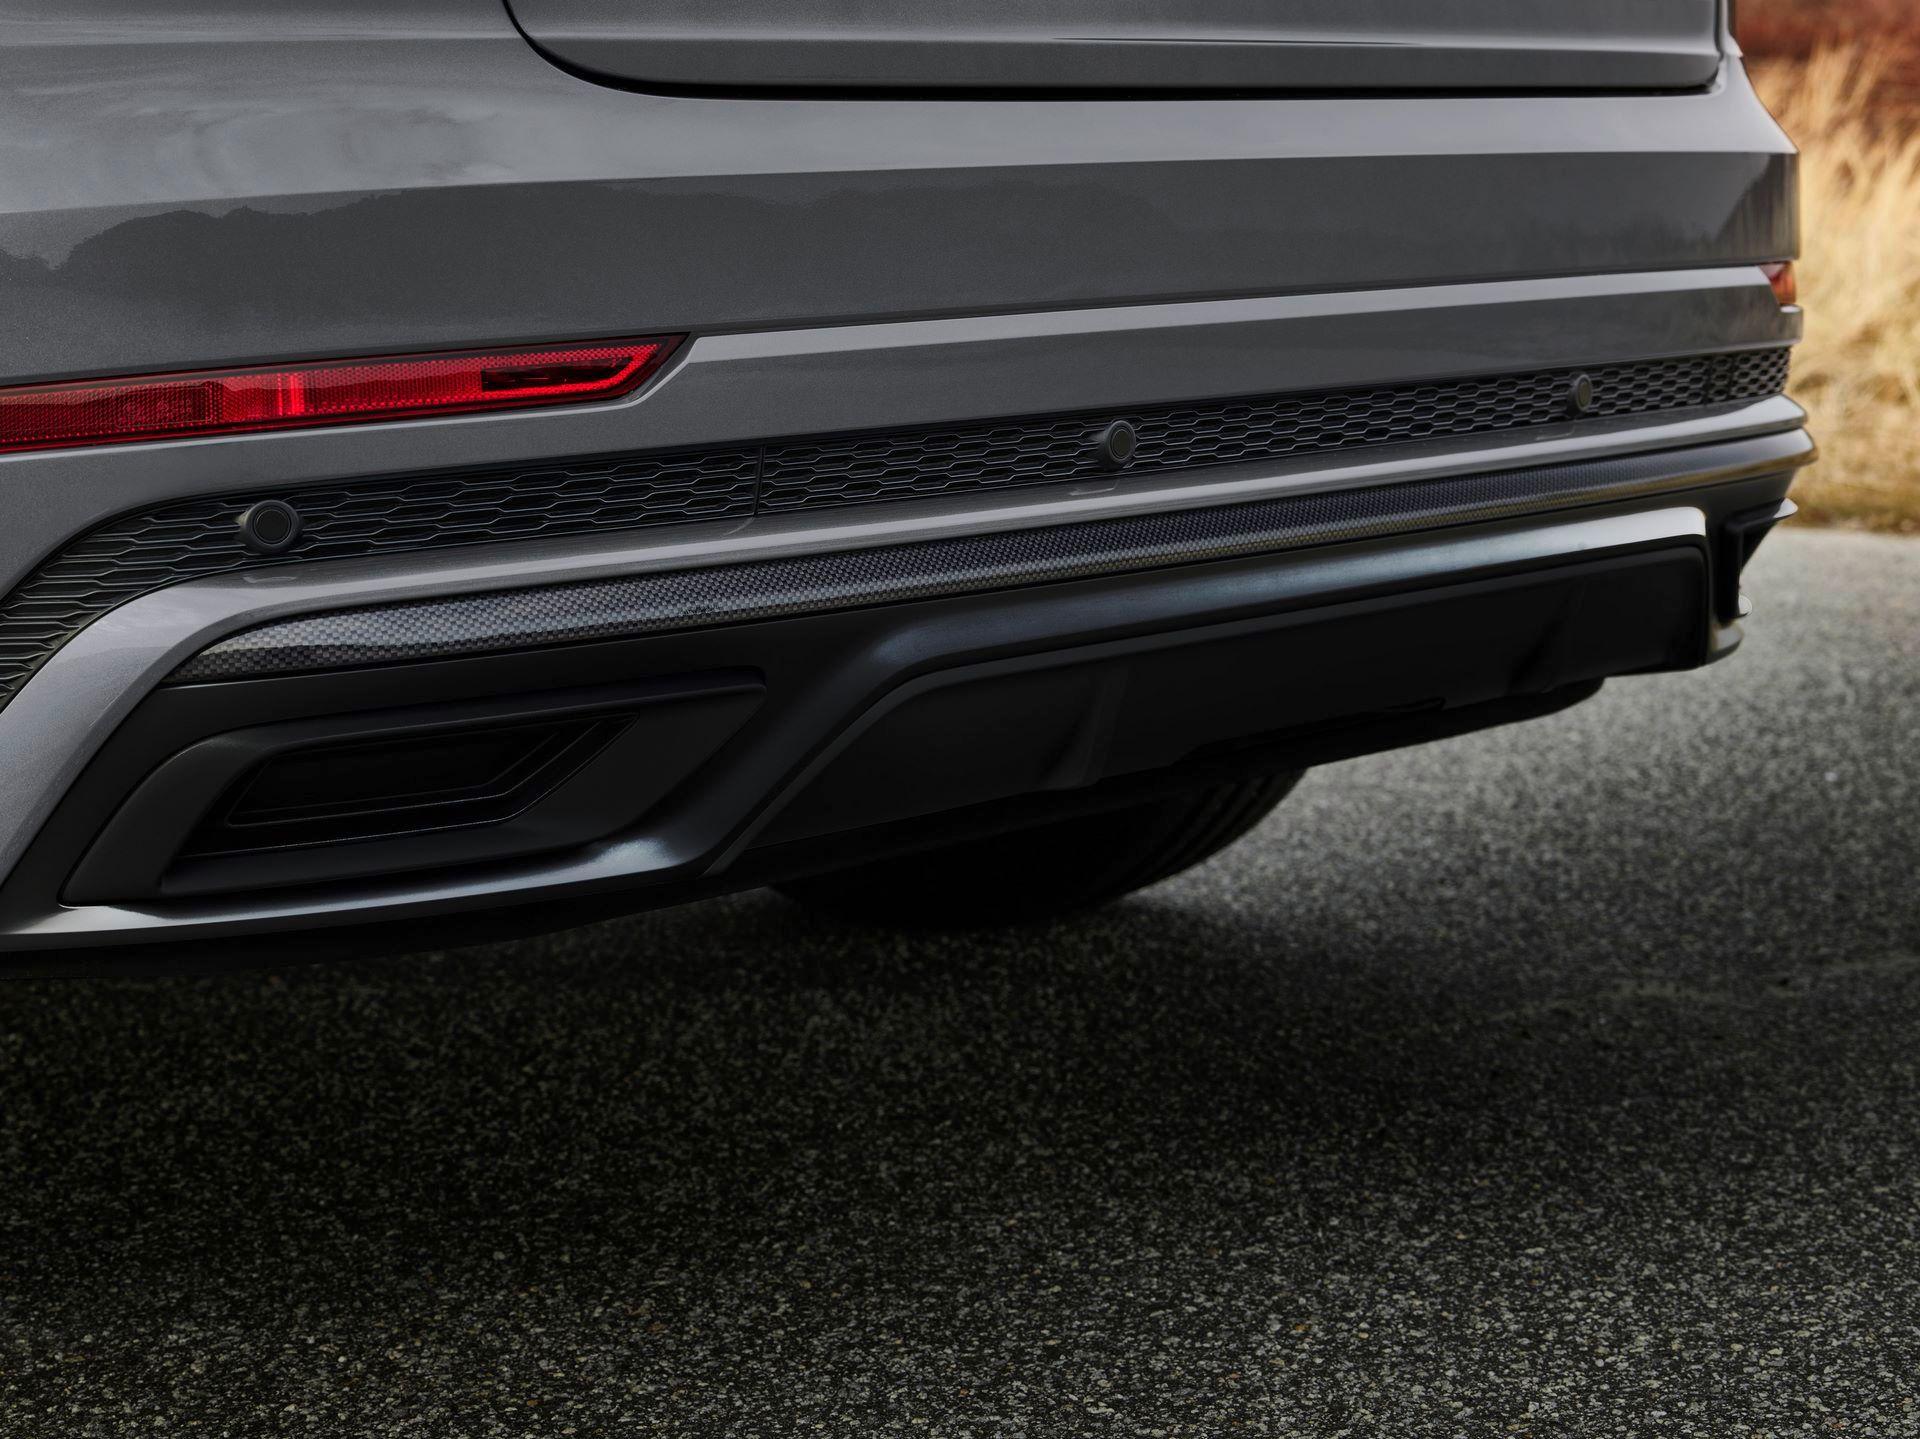 Audi-A4-A5-Q7-Q8-Competition-And-Competition-Plus-Trims-30